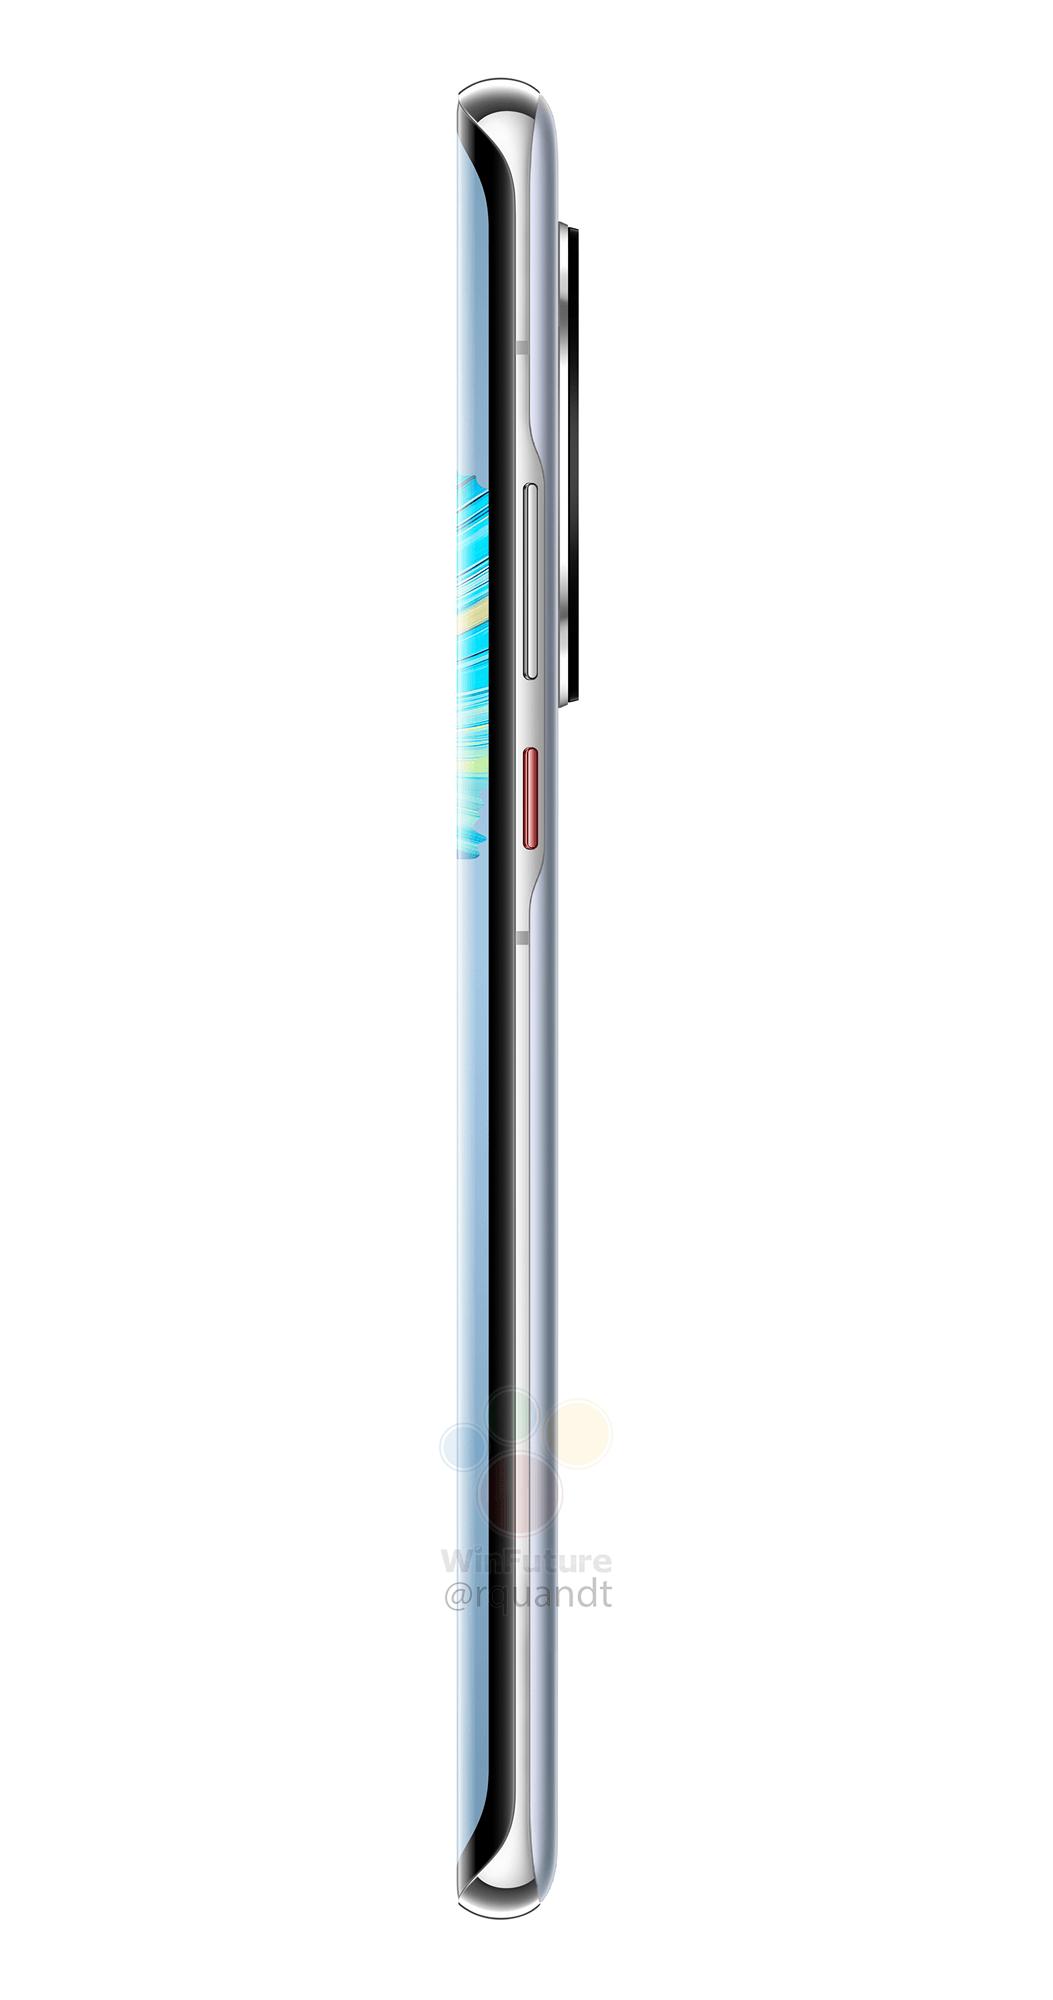 Huawei-Mate-40-Pro-1602925292-0-0-1